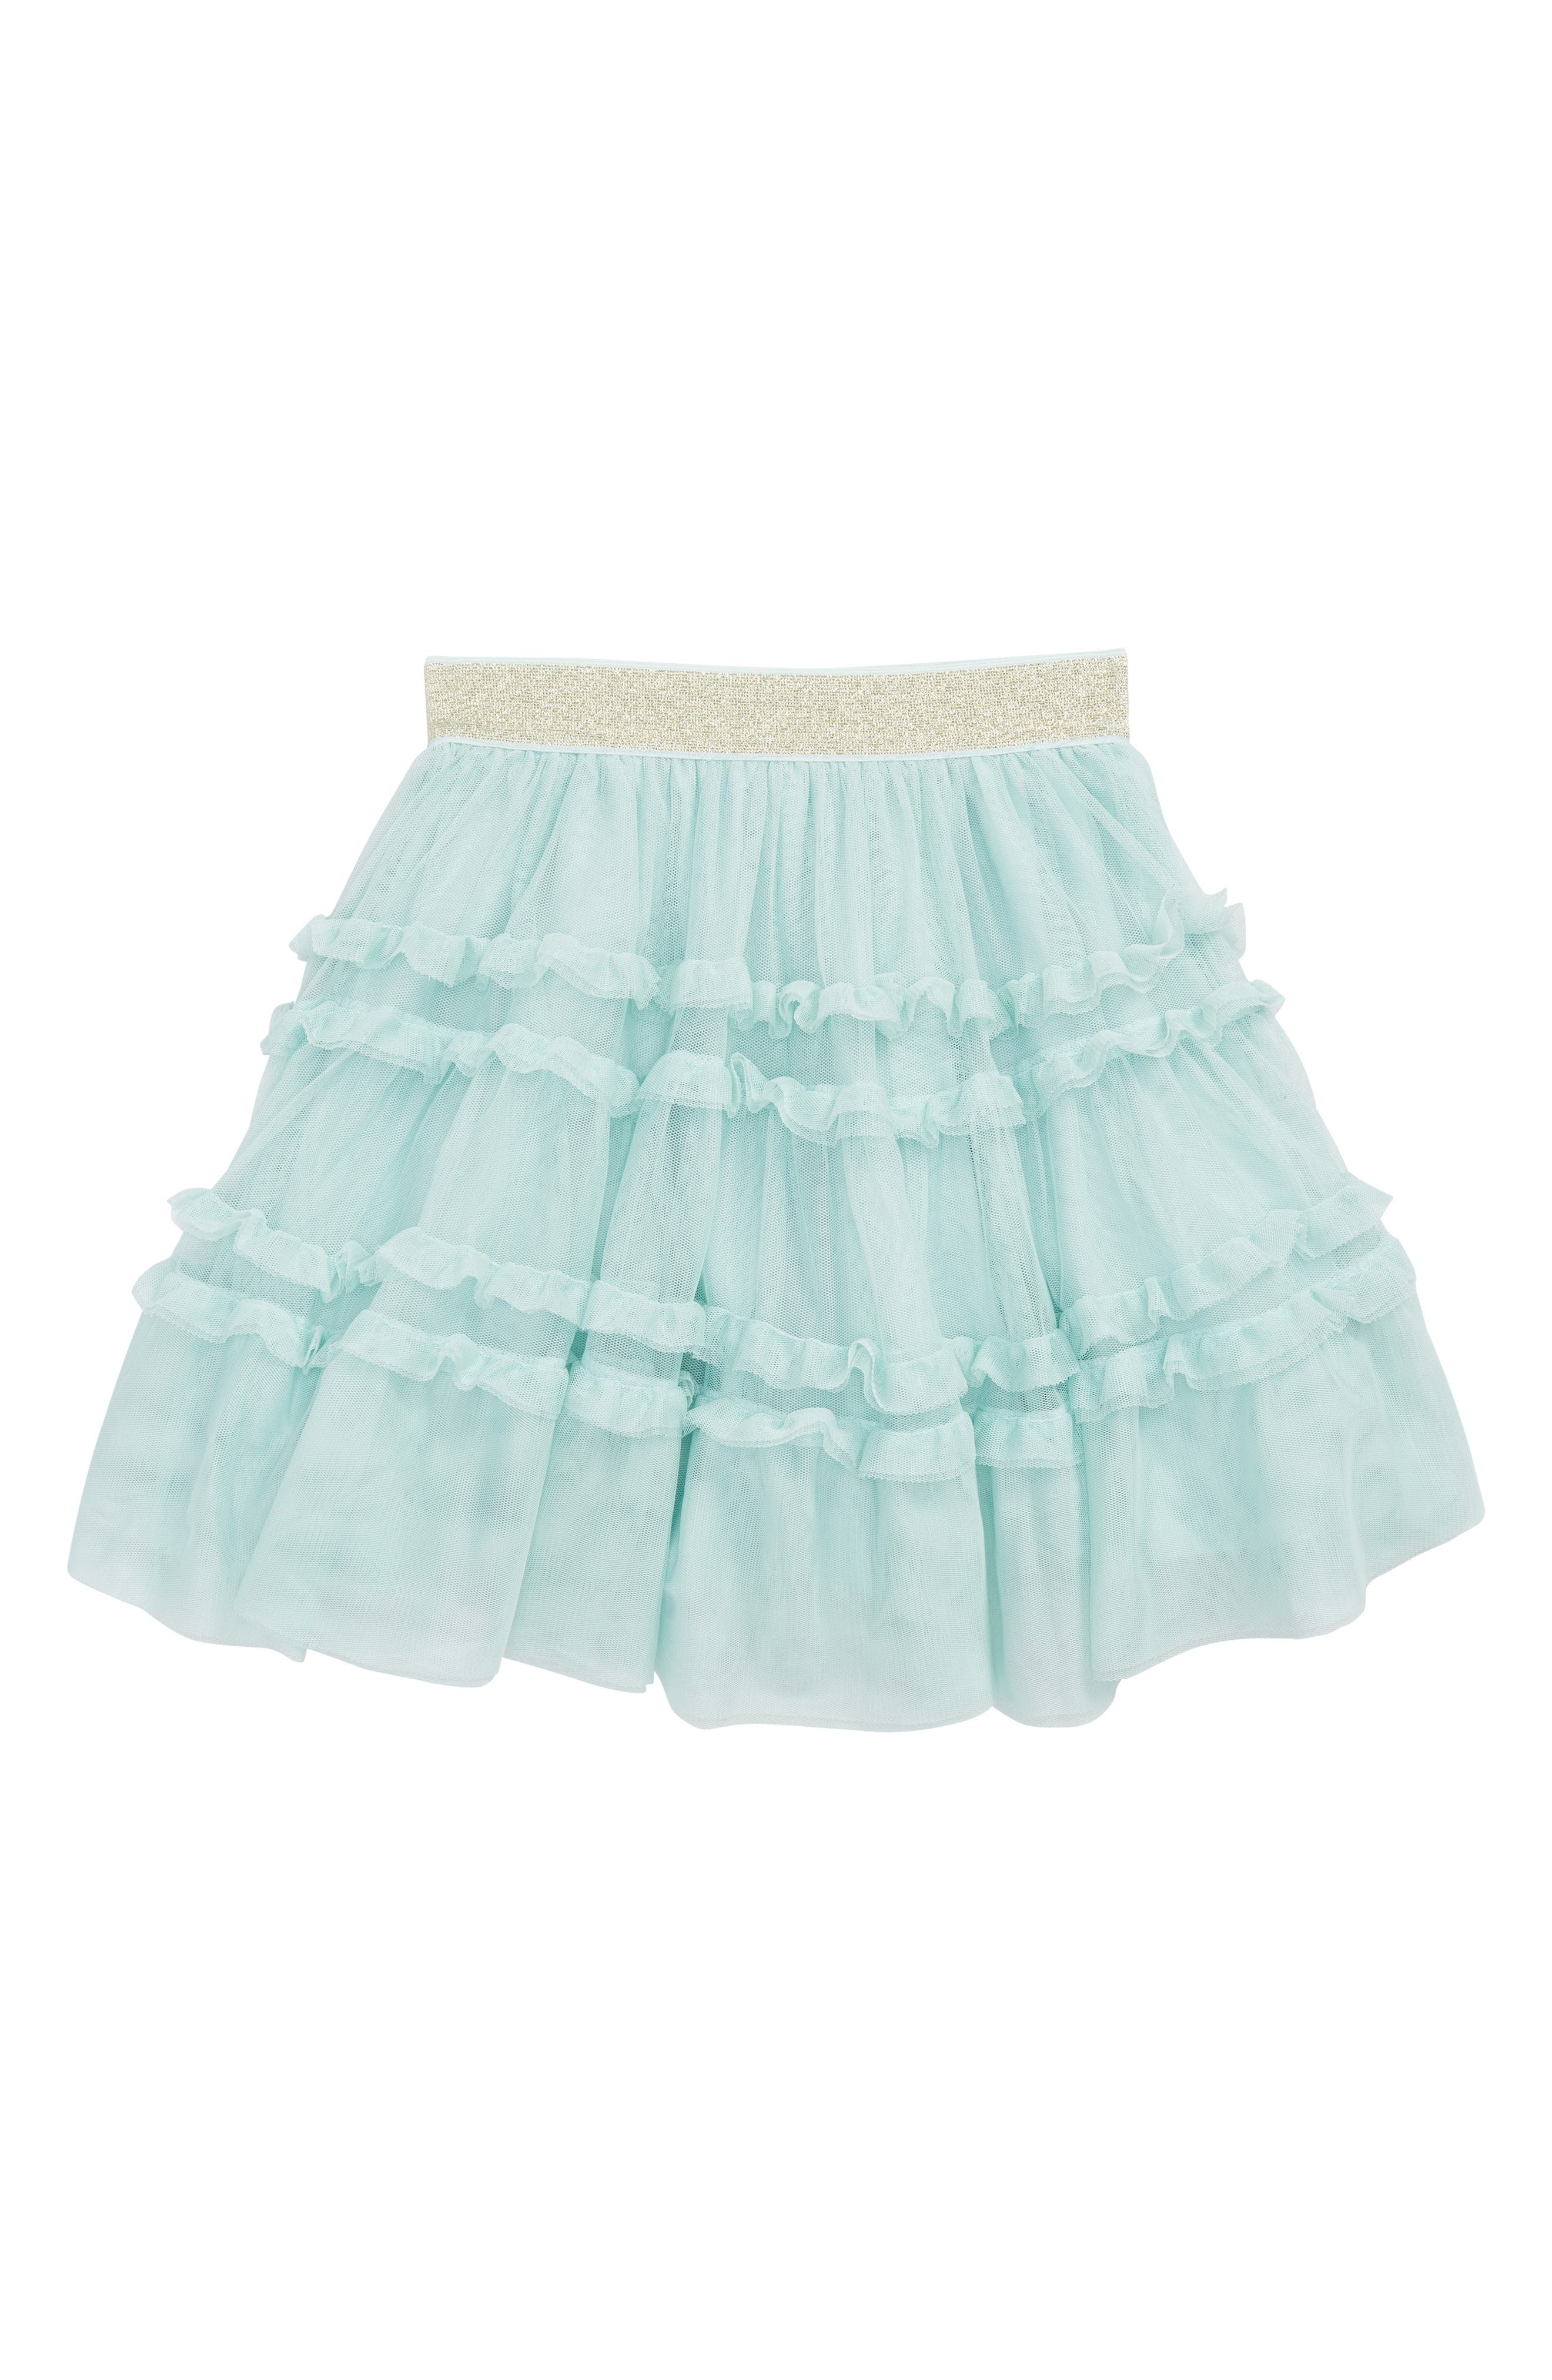 Ruffle Tulle Skirt,                             Main thumbnail 1, color,                             454